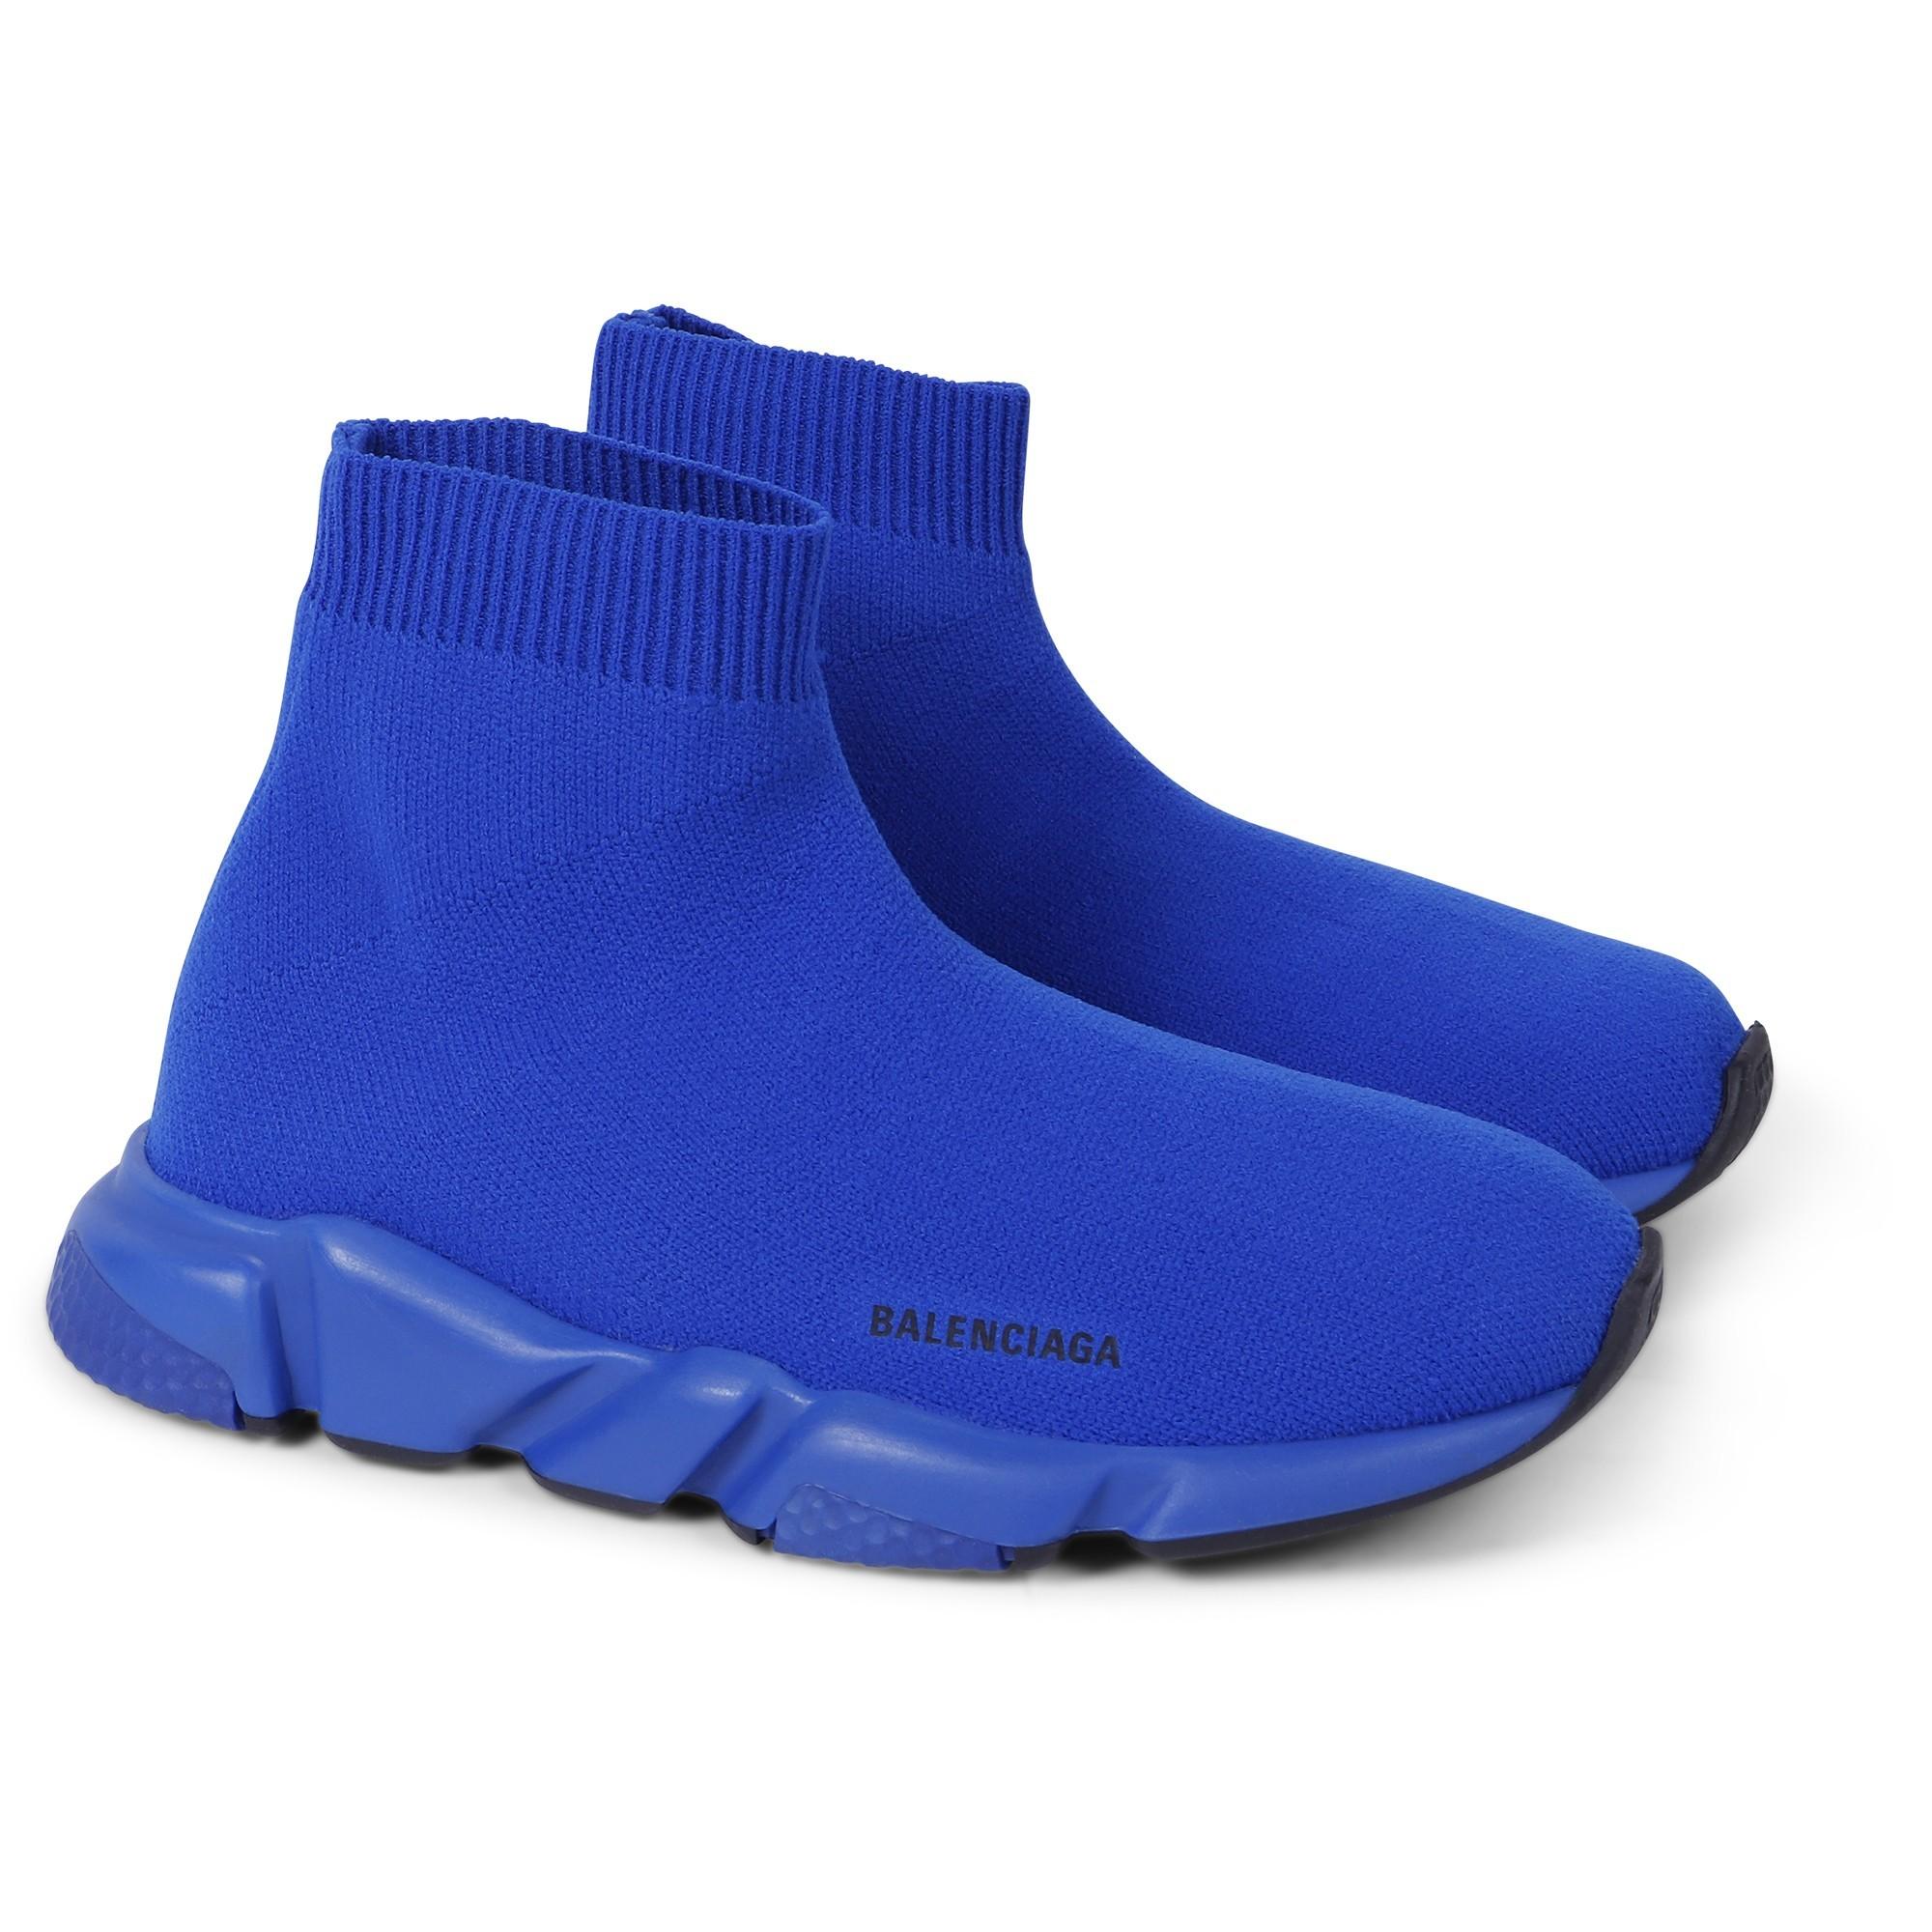 Balenciaga Blue Knit Sock Sneakers